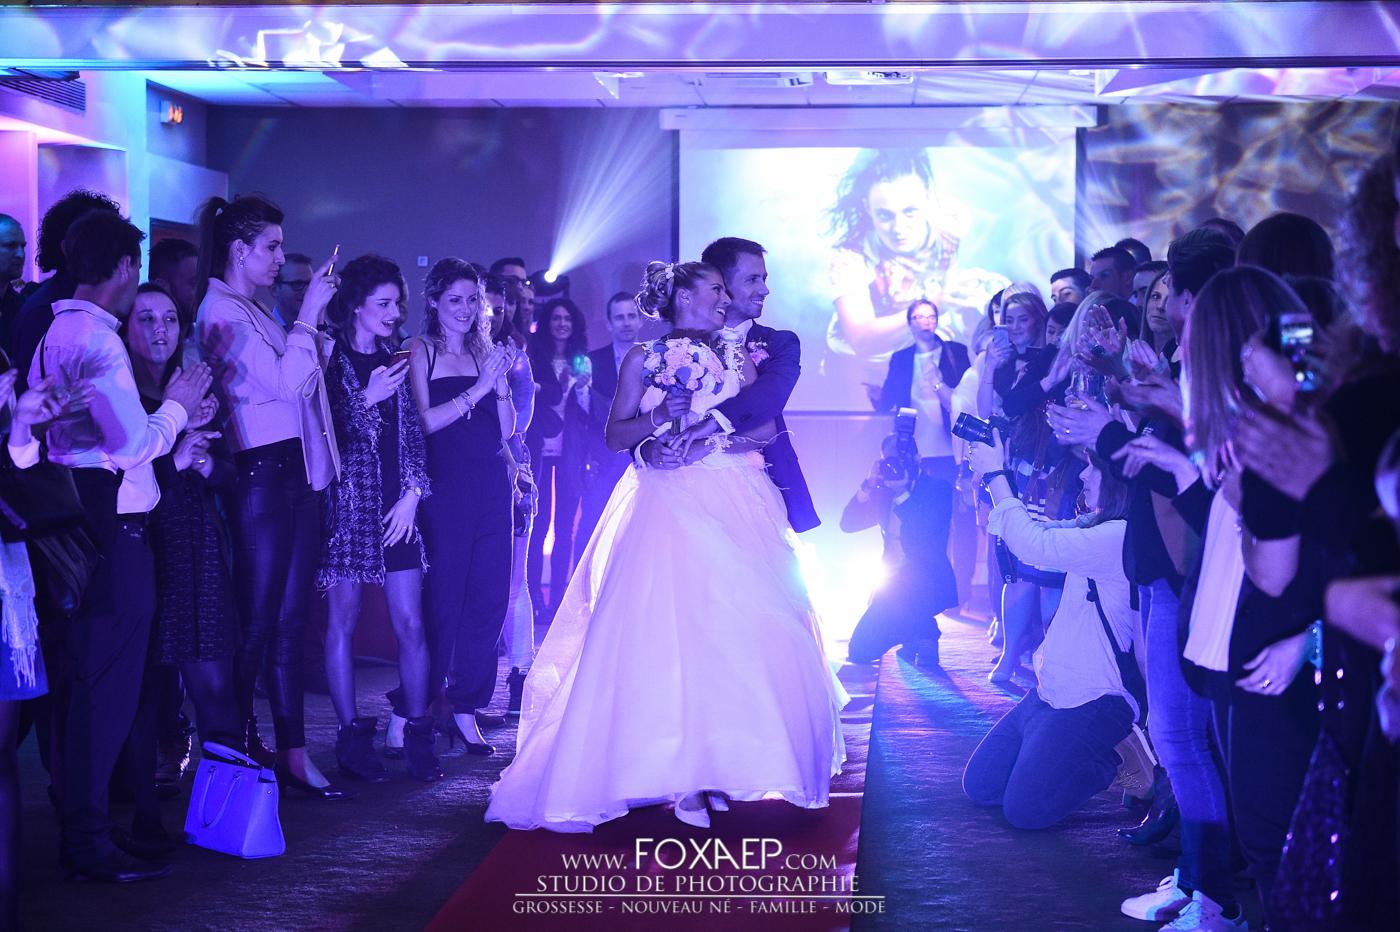 foxaep-photographe-mariage-dijon-annecy-lt-0417